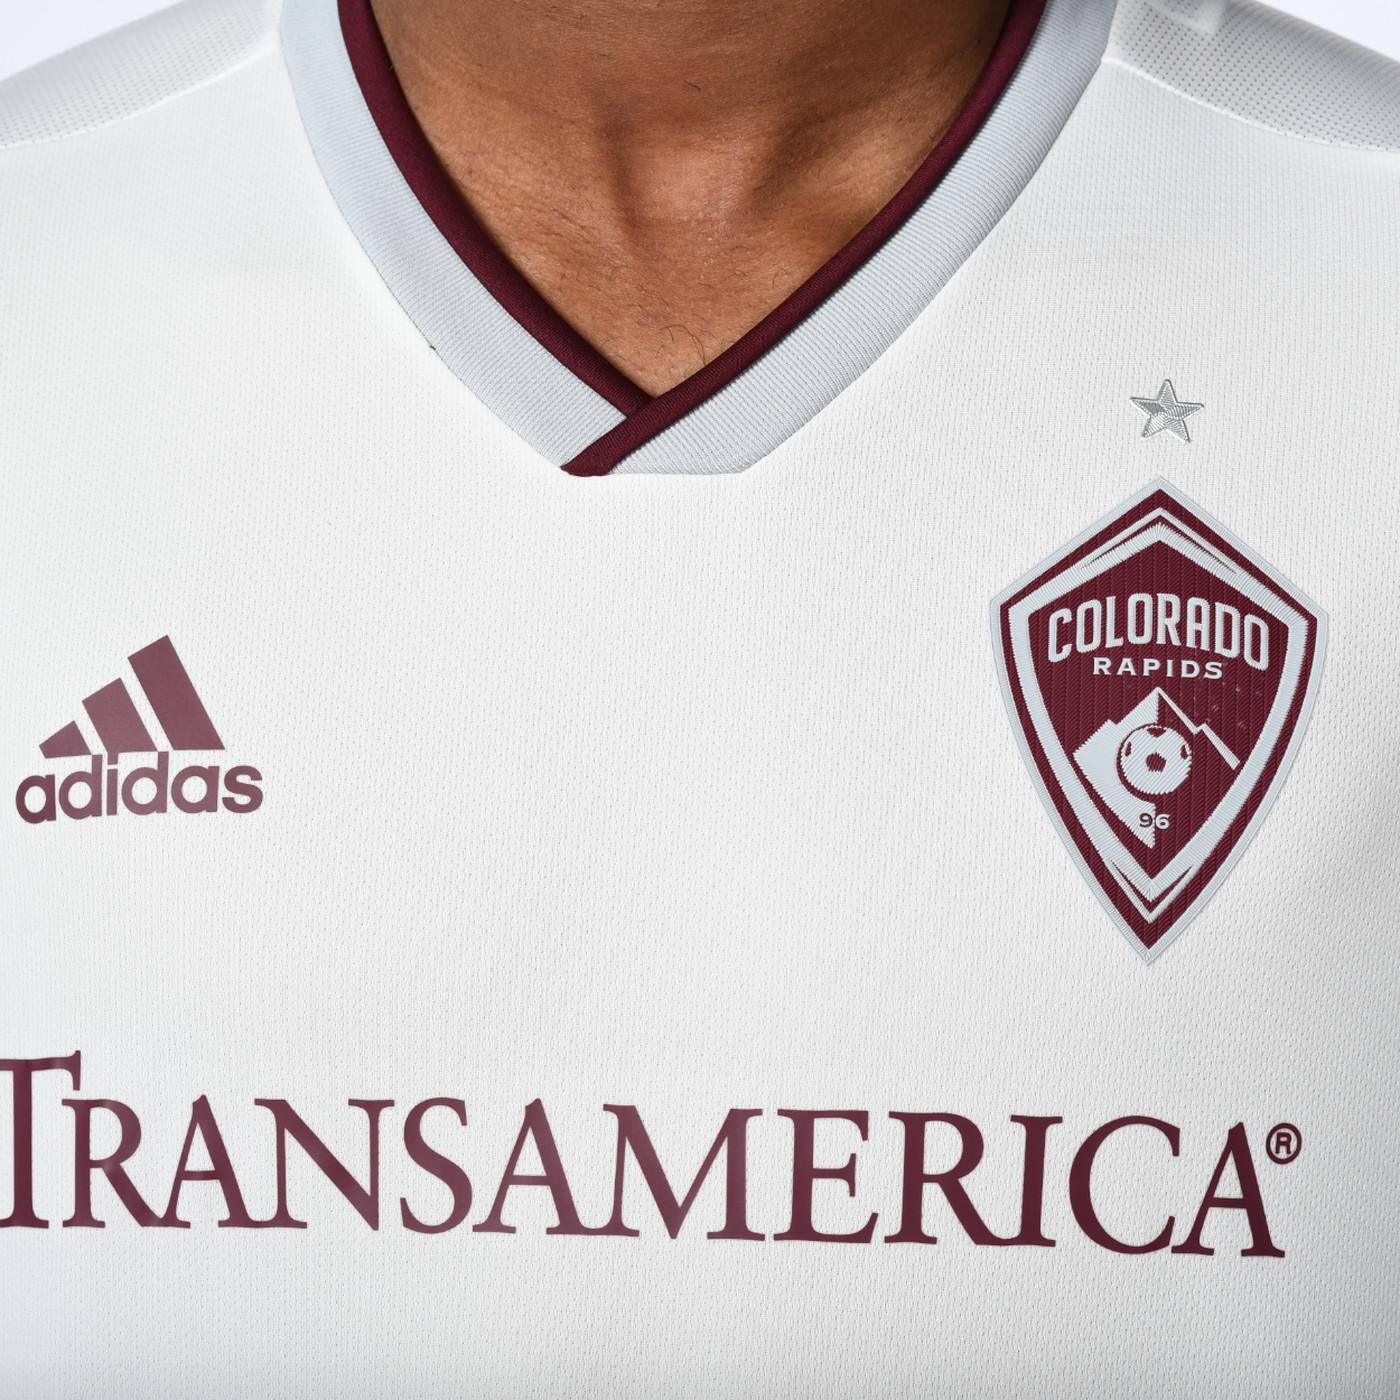 Transamerica renews deal as Colorado Rapids jersey sponsor ...